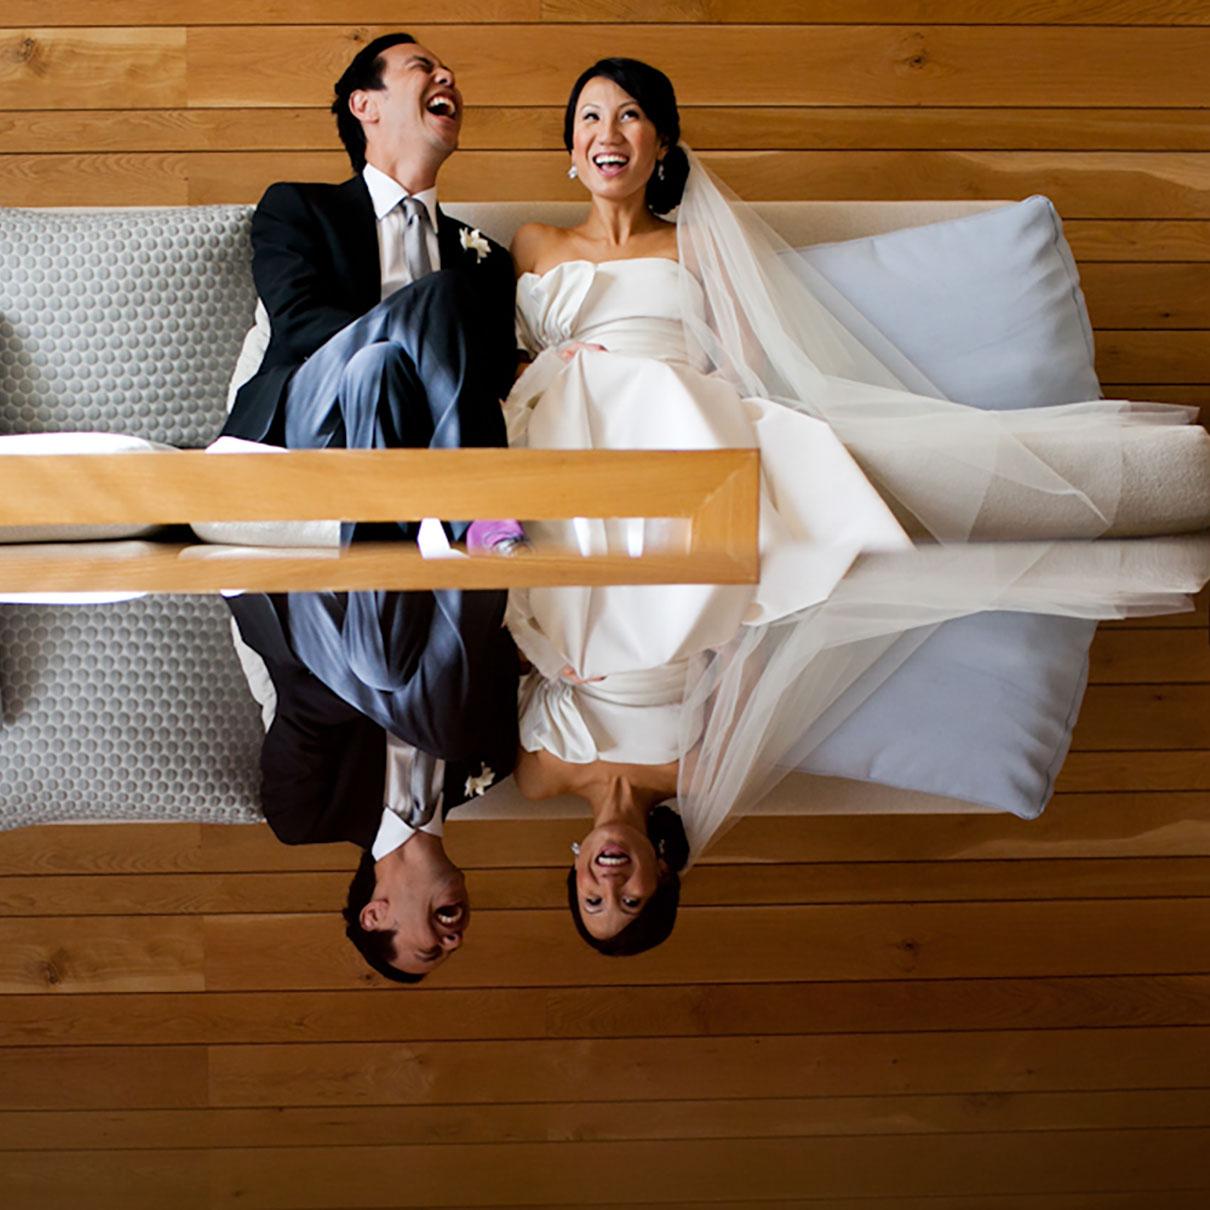 bridegroomsanfranciscoweddingfeature Mango Muse Events